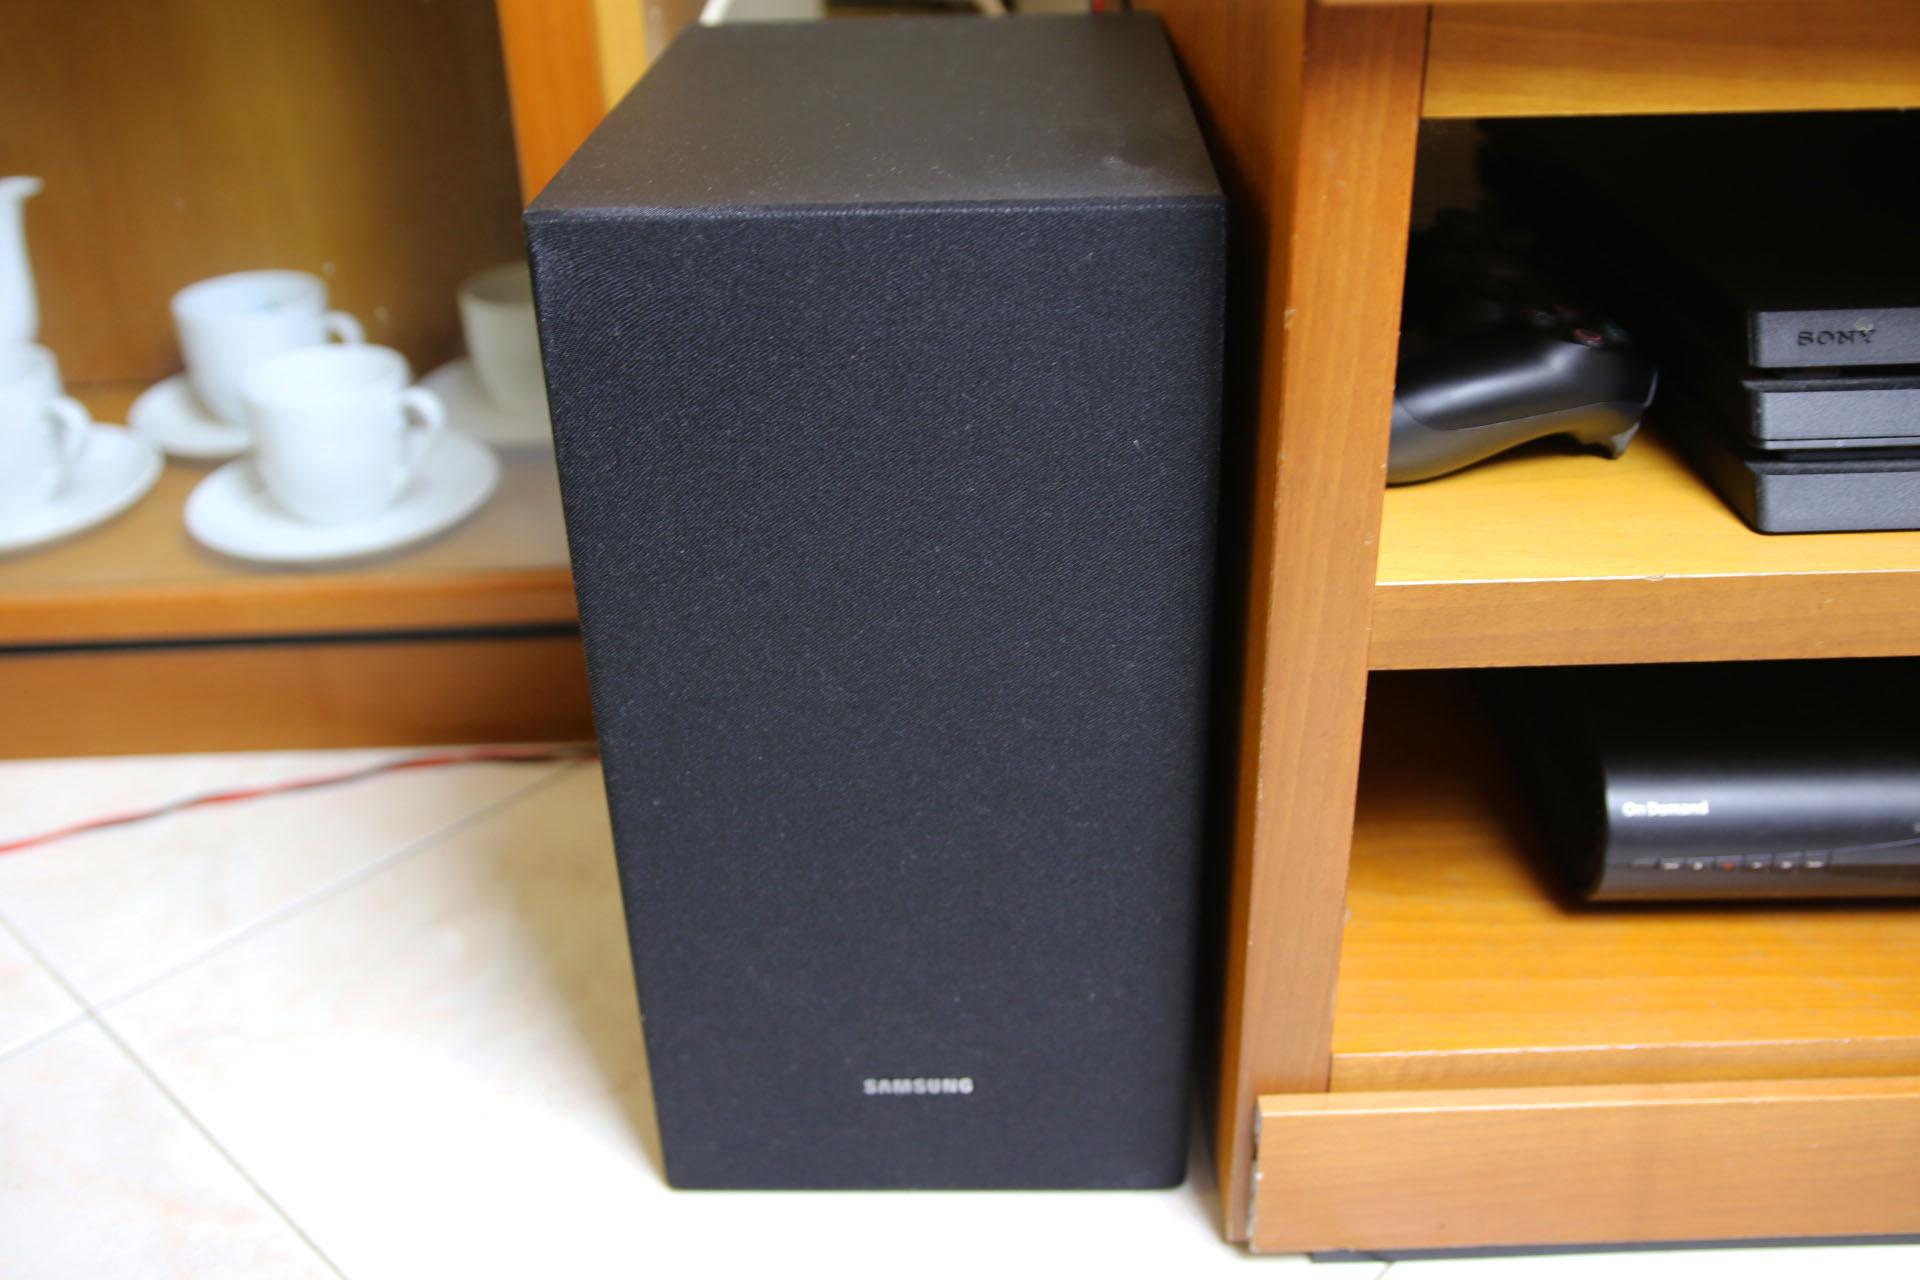 Samsung R430 Subwoofer Soundbar